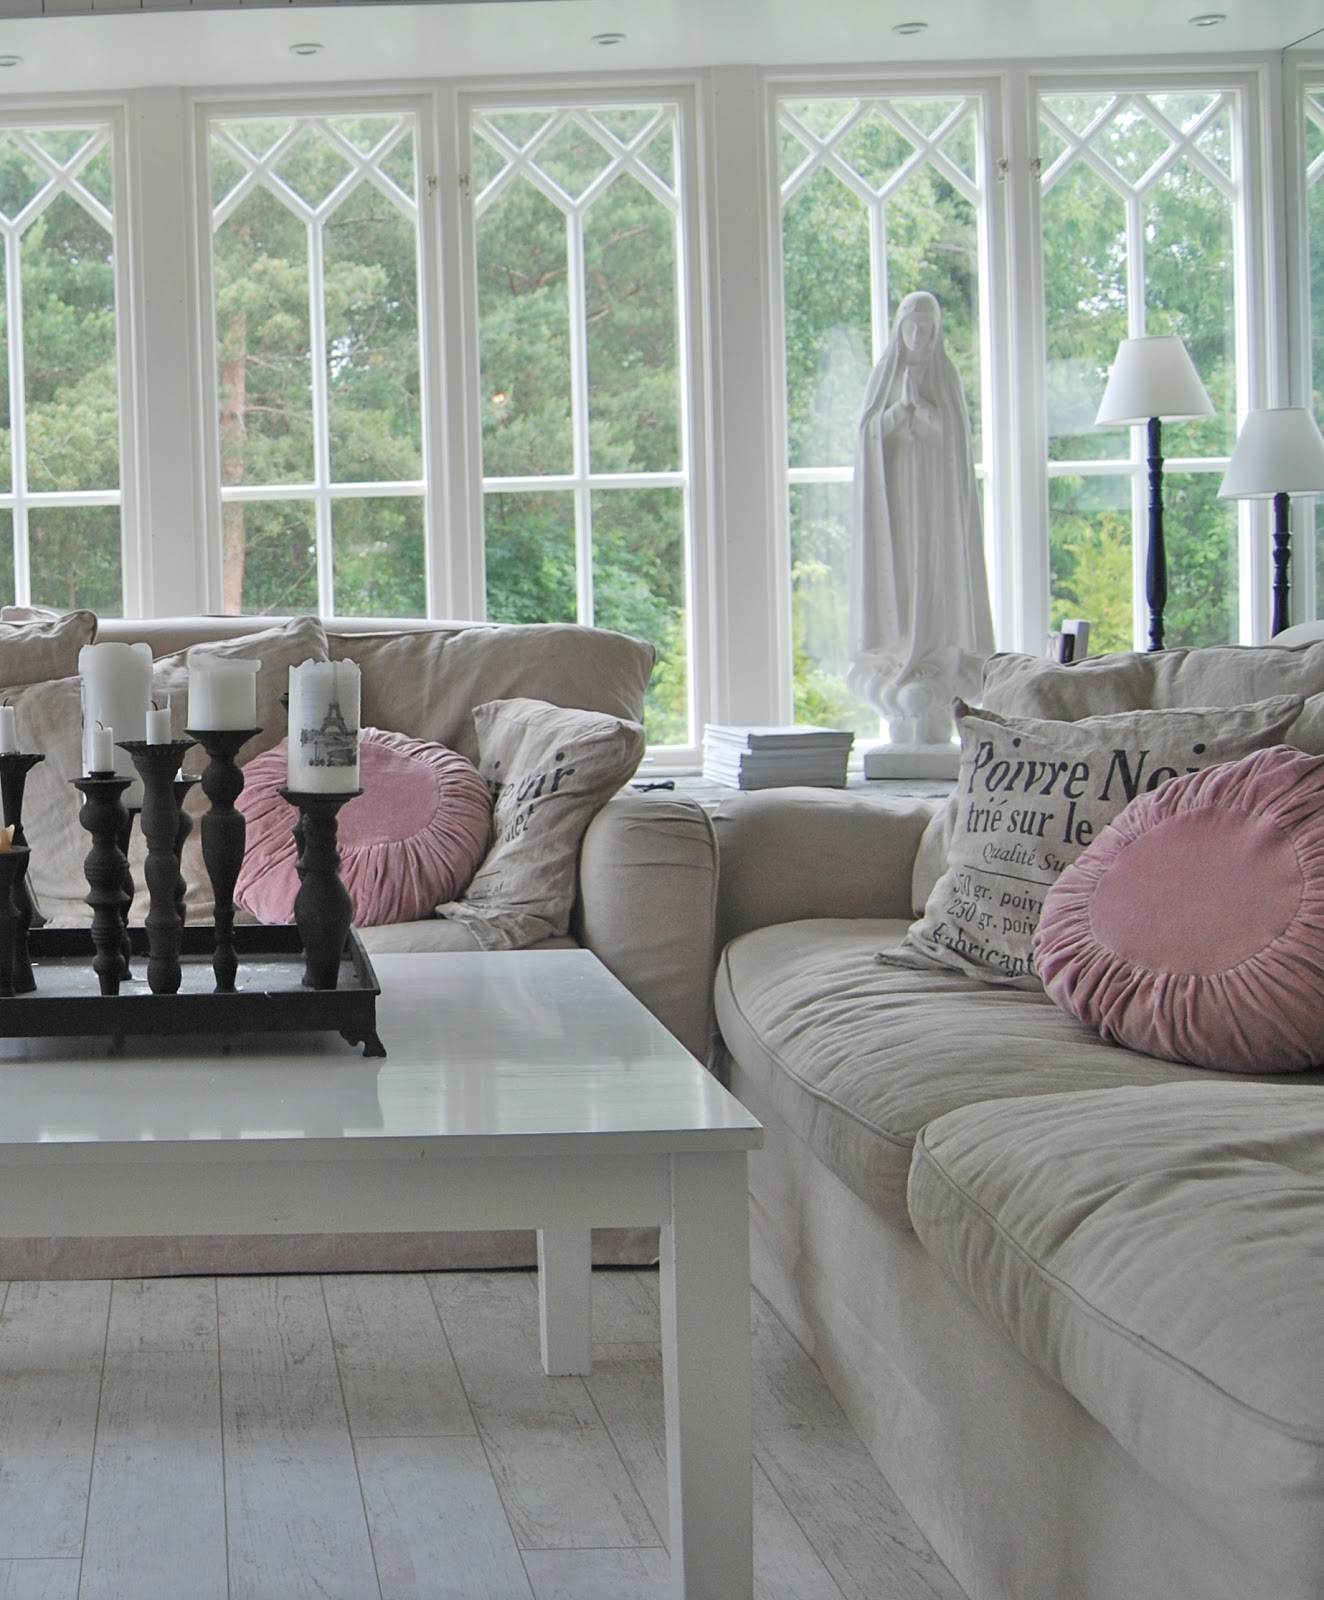 Huset sjöljus: Älskade fönster!